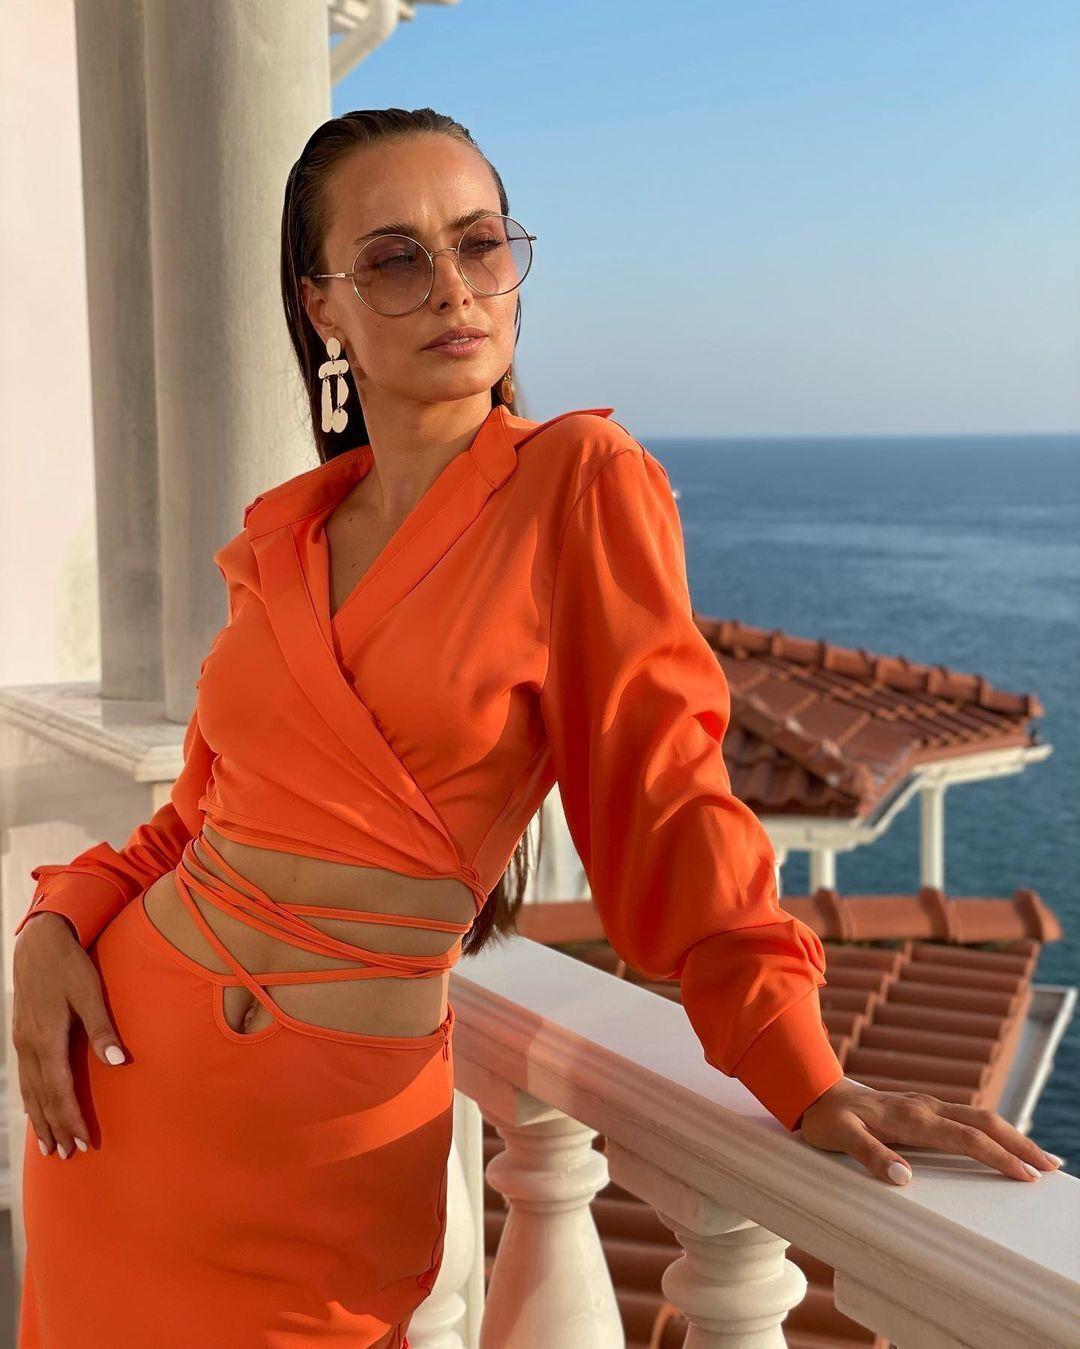 Популярная украинская актриса Ксения Мишина